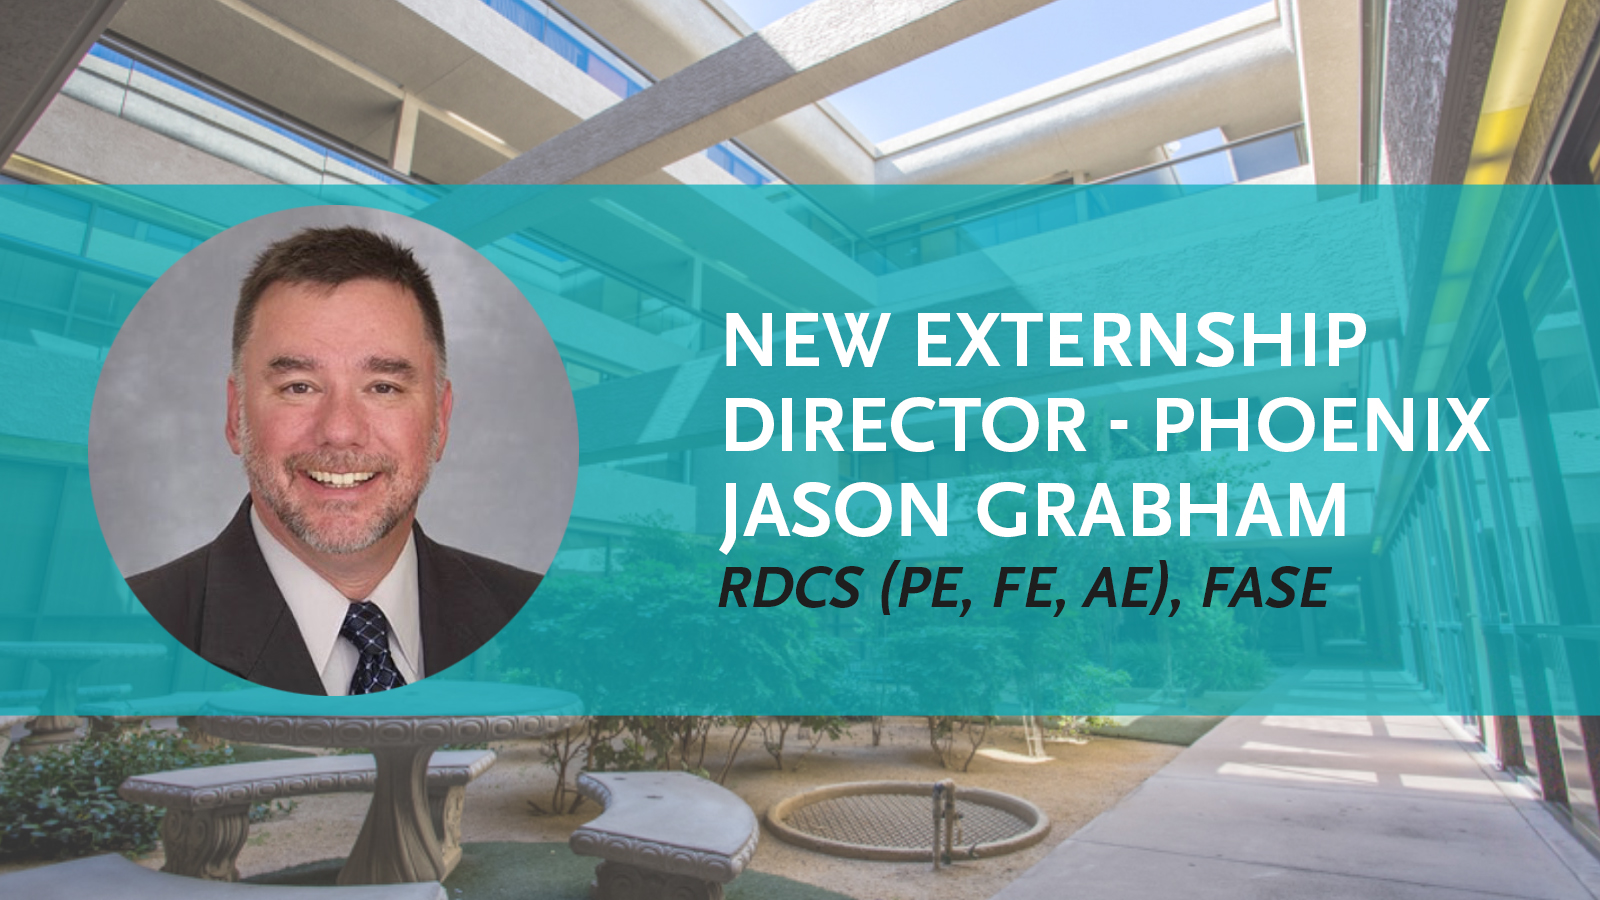 Jason Grabham is the new Phoenix Director of Externship